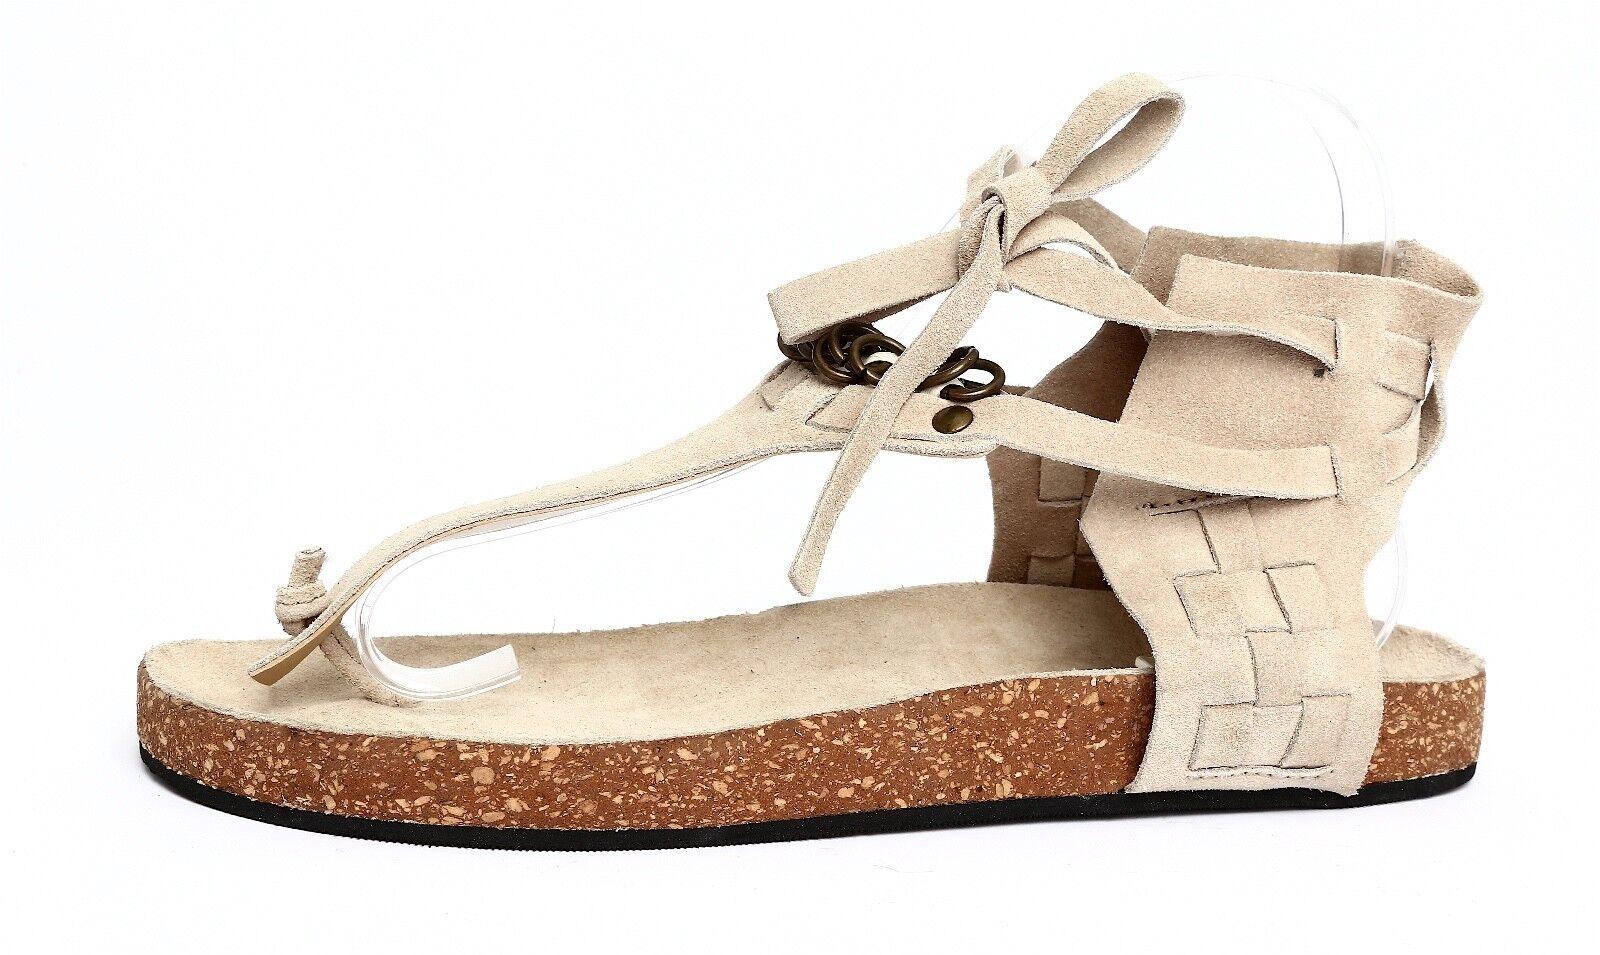 Free People Women's Tan Suede Sandals Sz 37